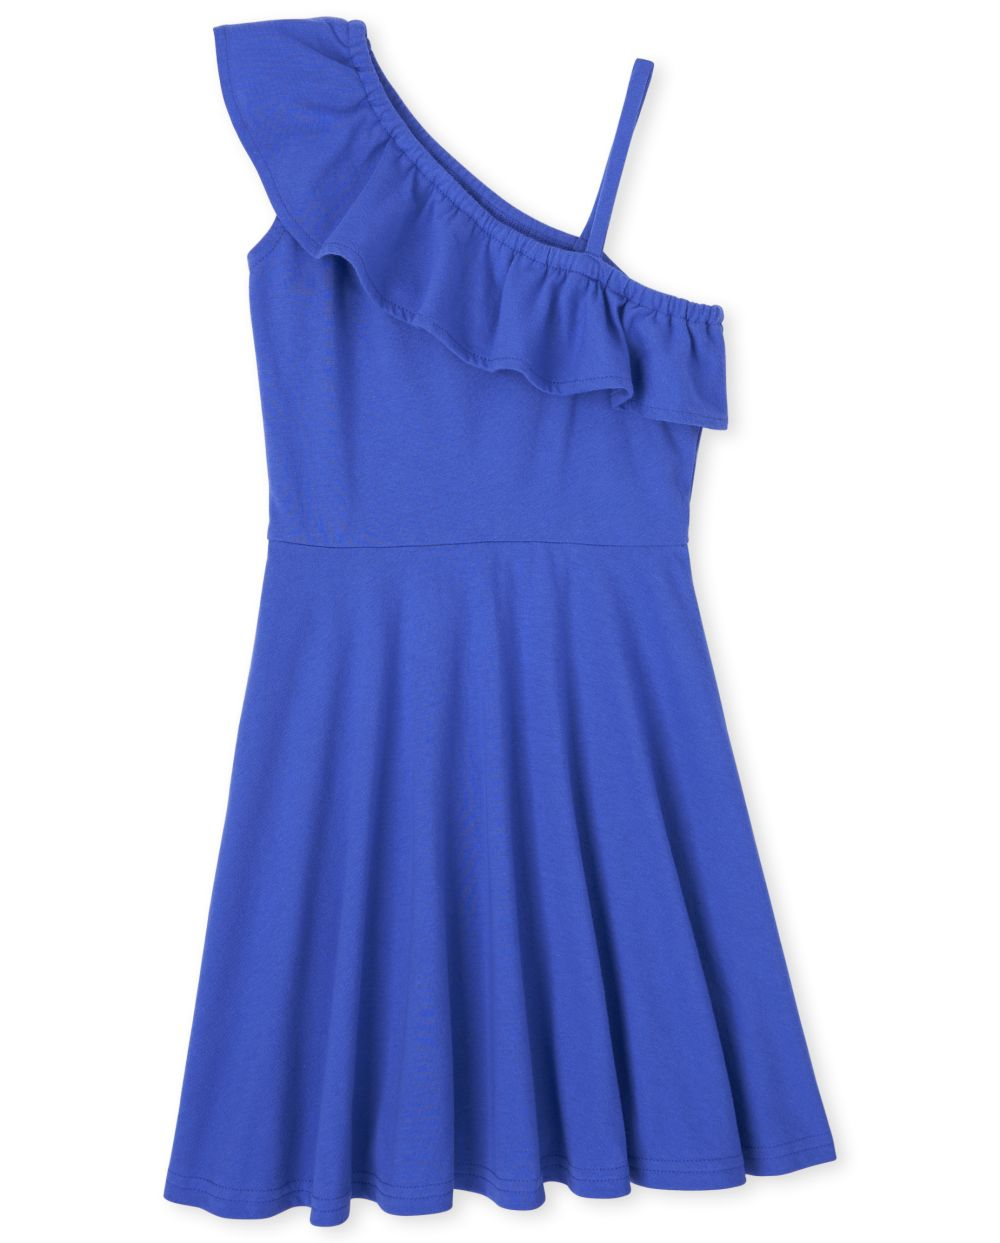 Girls Ruffle One Shoulder Dress